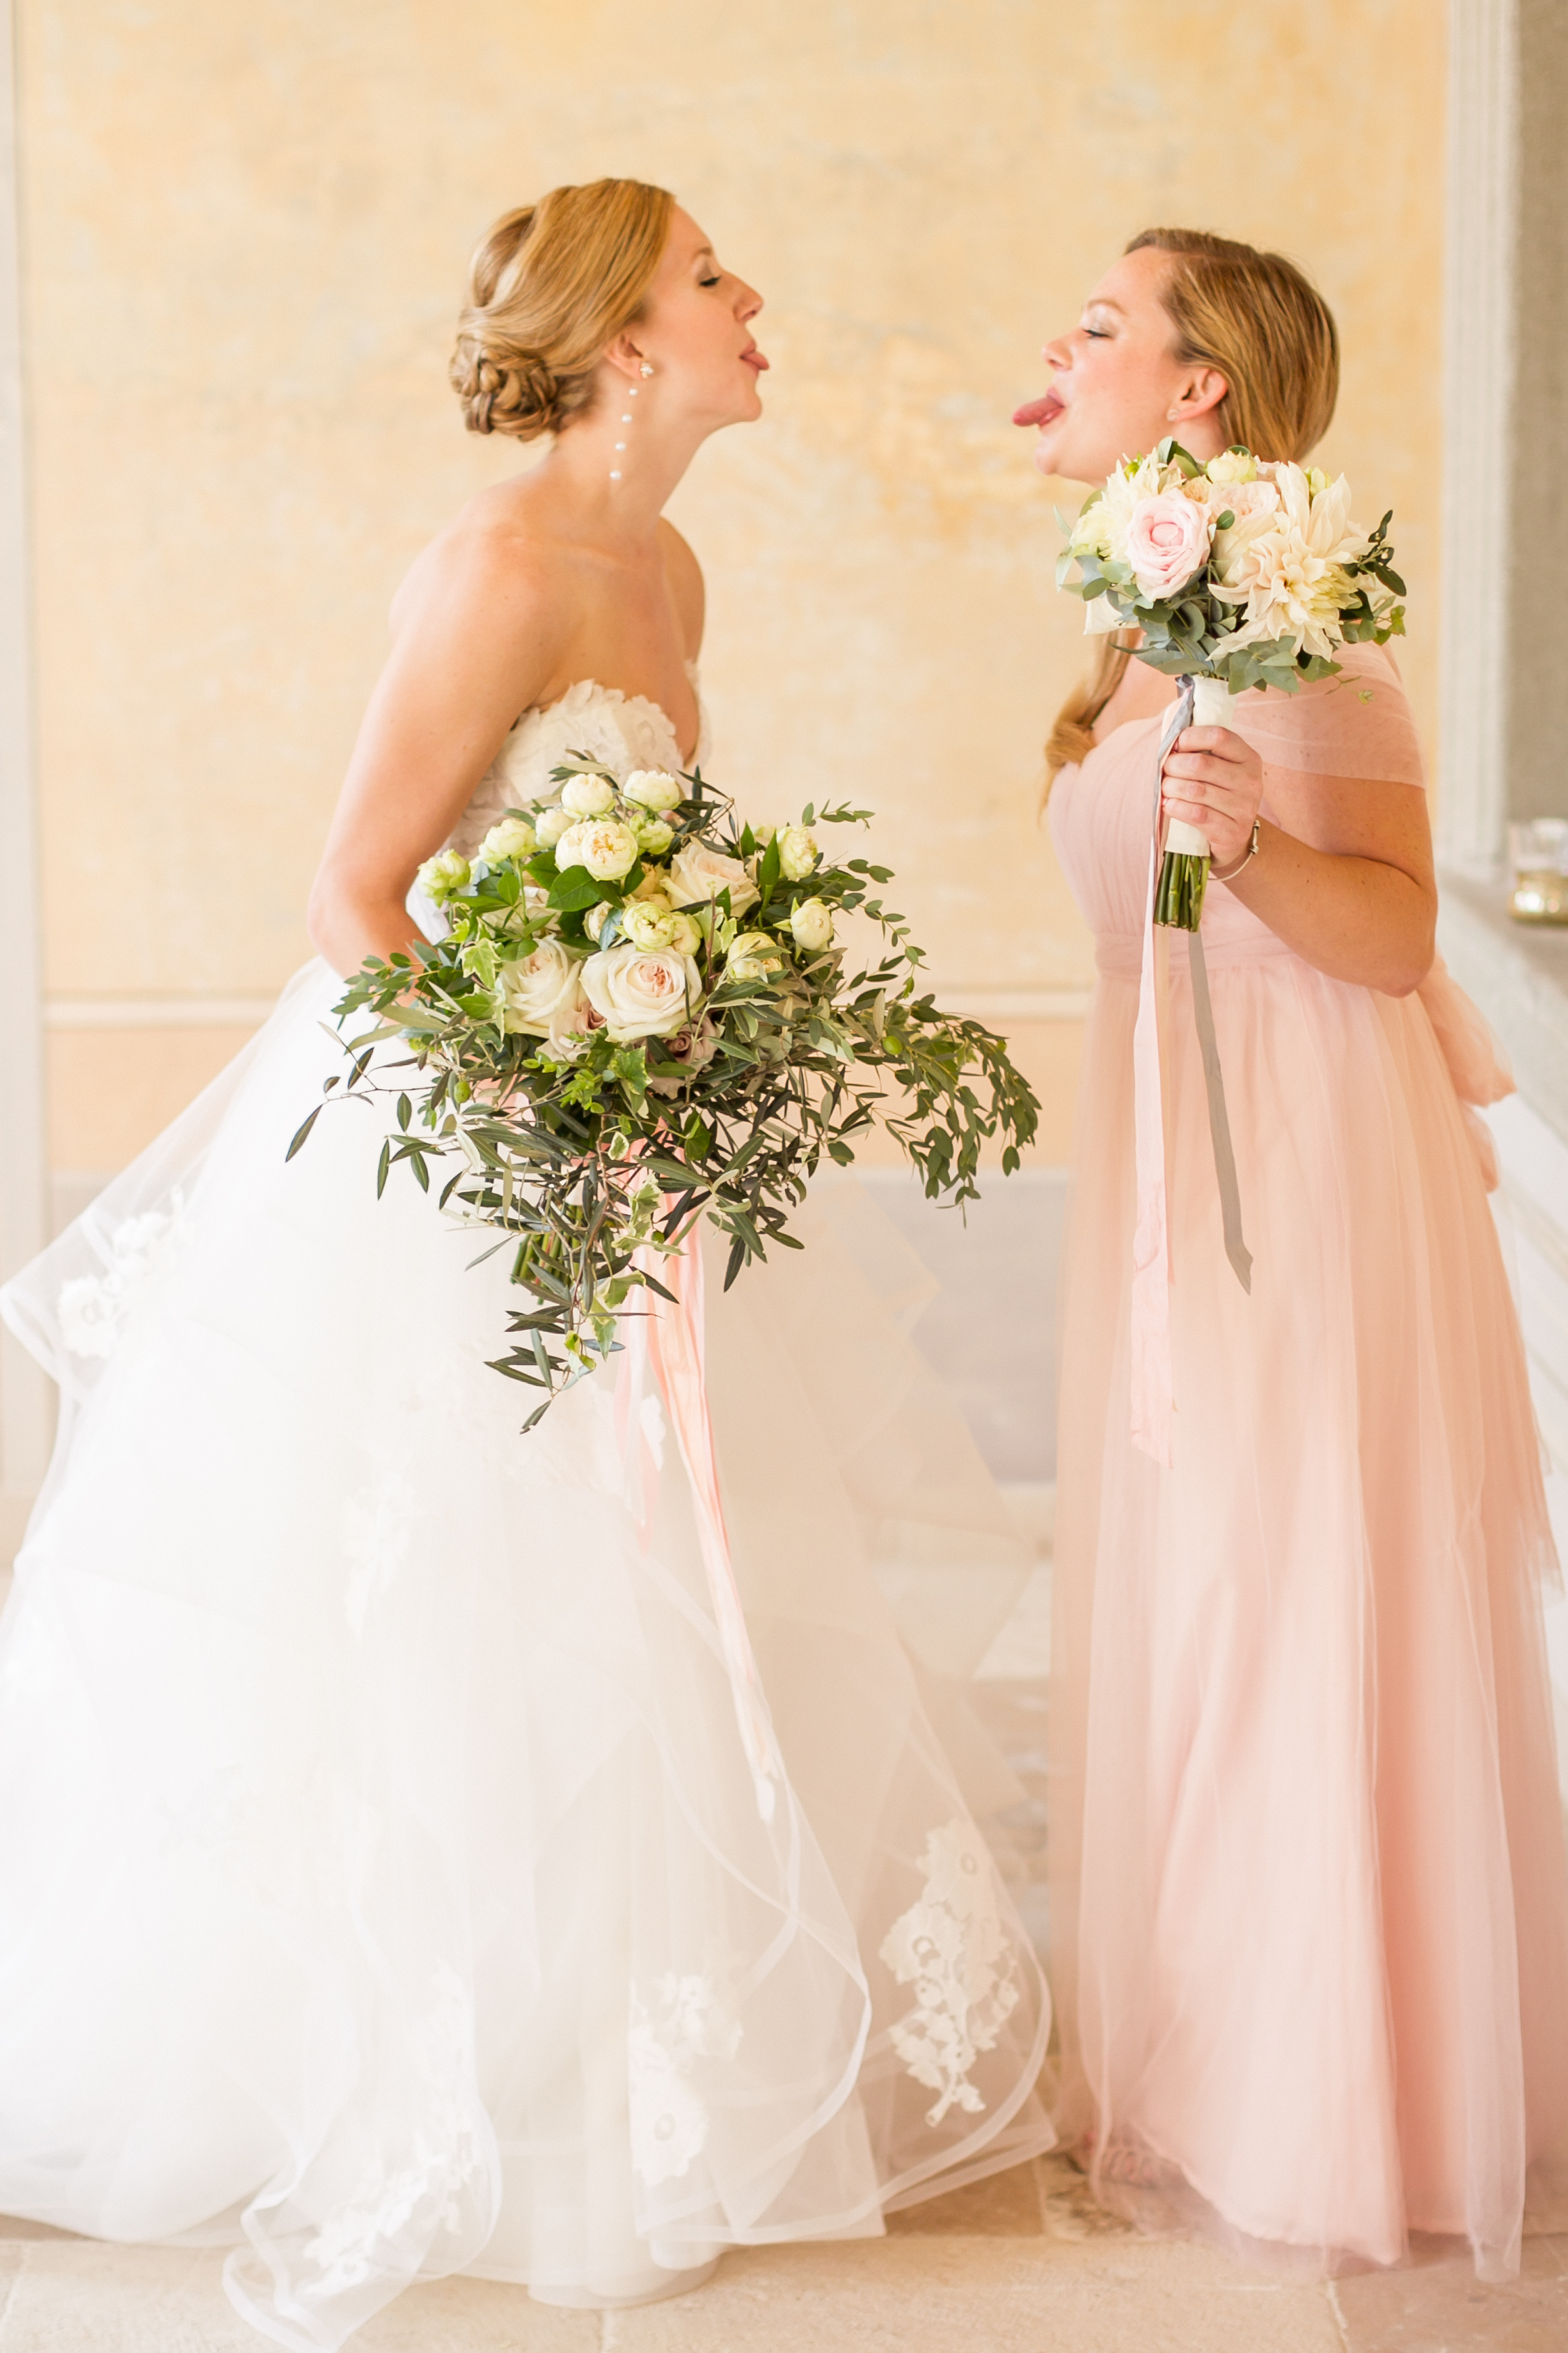 04_bridesmaids-0445.jpg